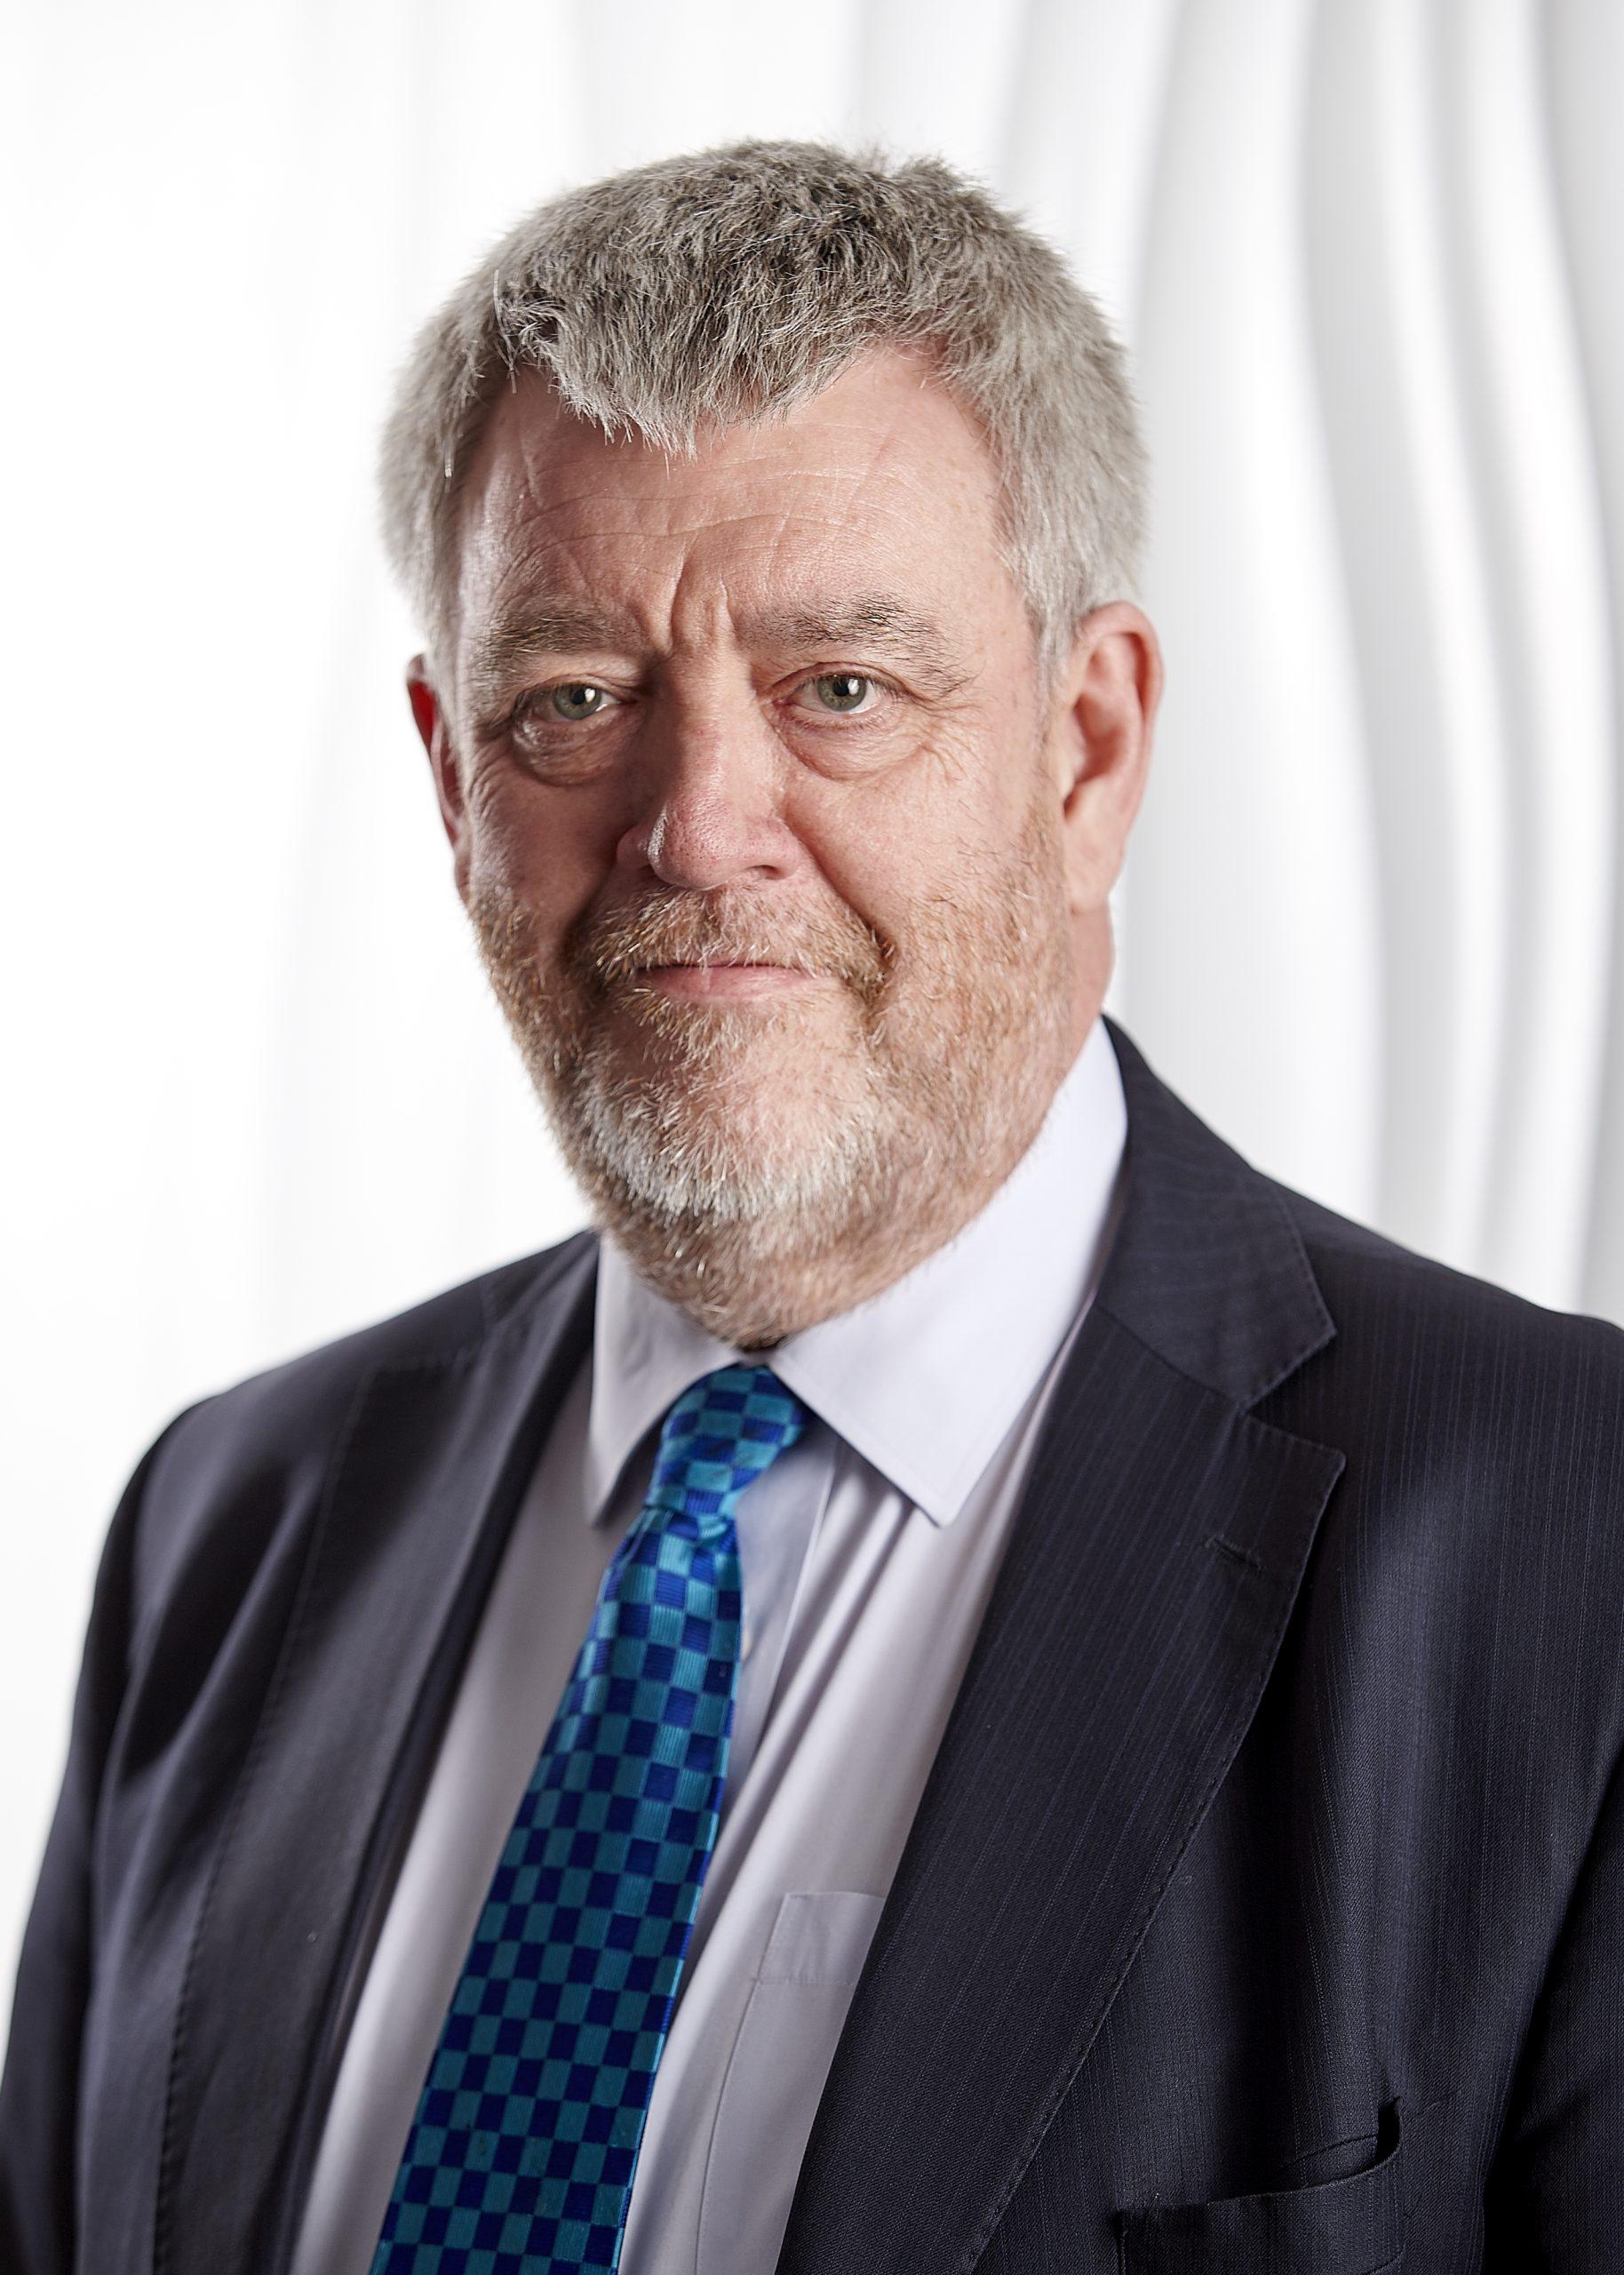 Hospice Trustee Roles